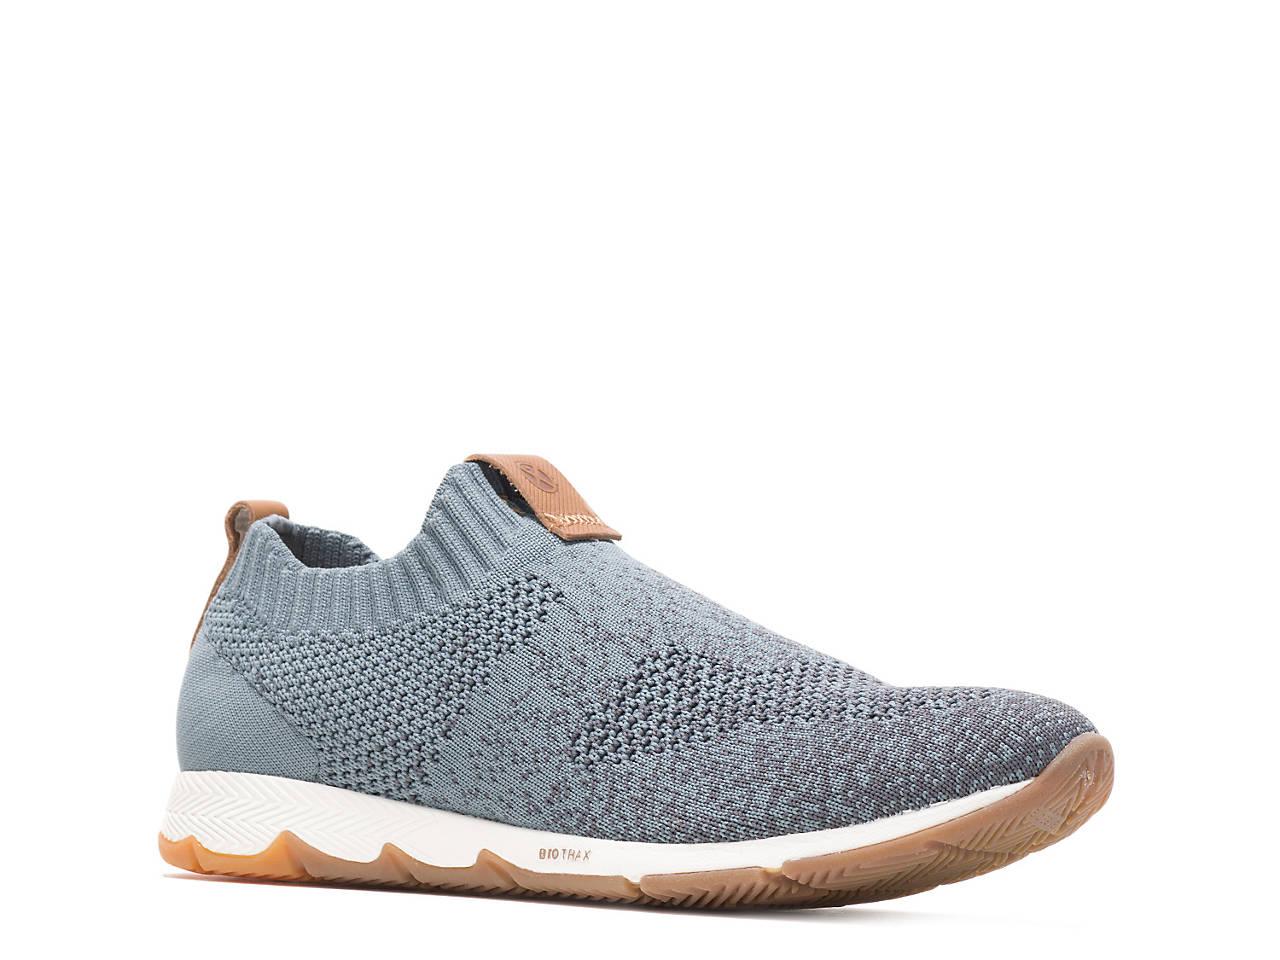 887fb3610108e Hush Puppies Cesky Slip-On Sneaker Women's Shoes | DSW